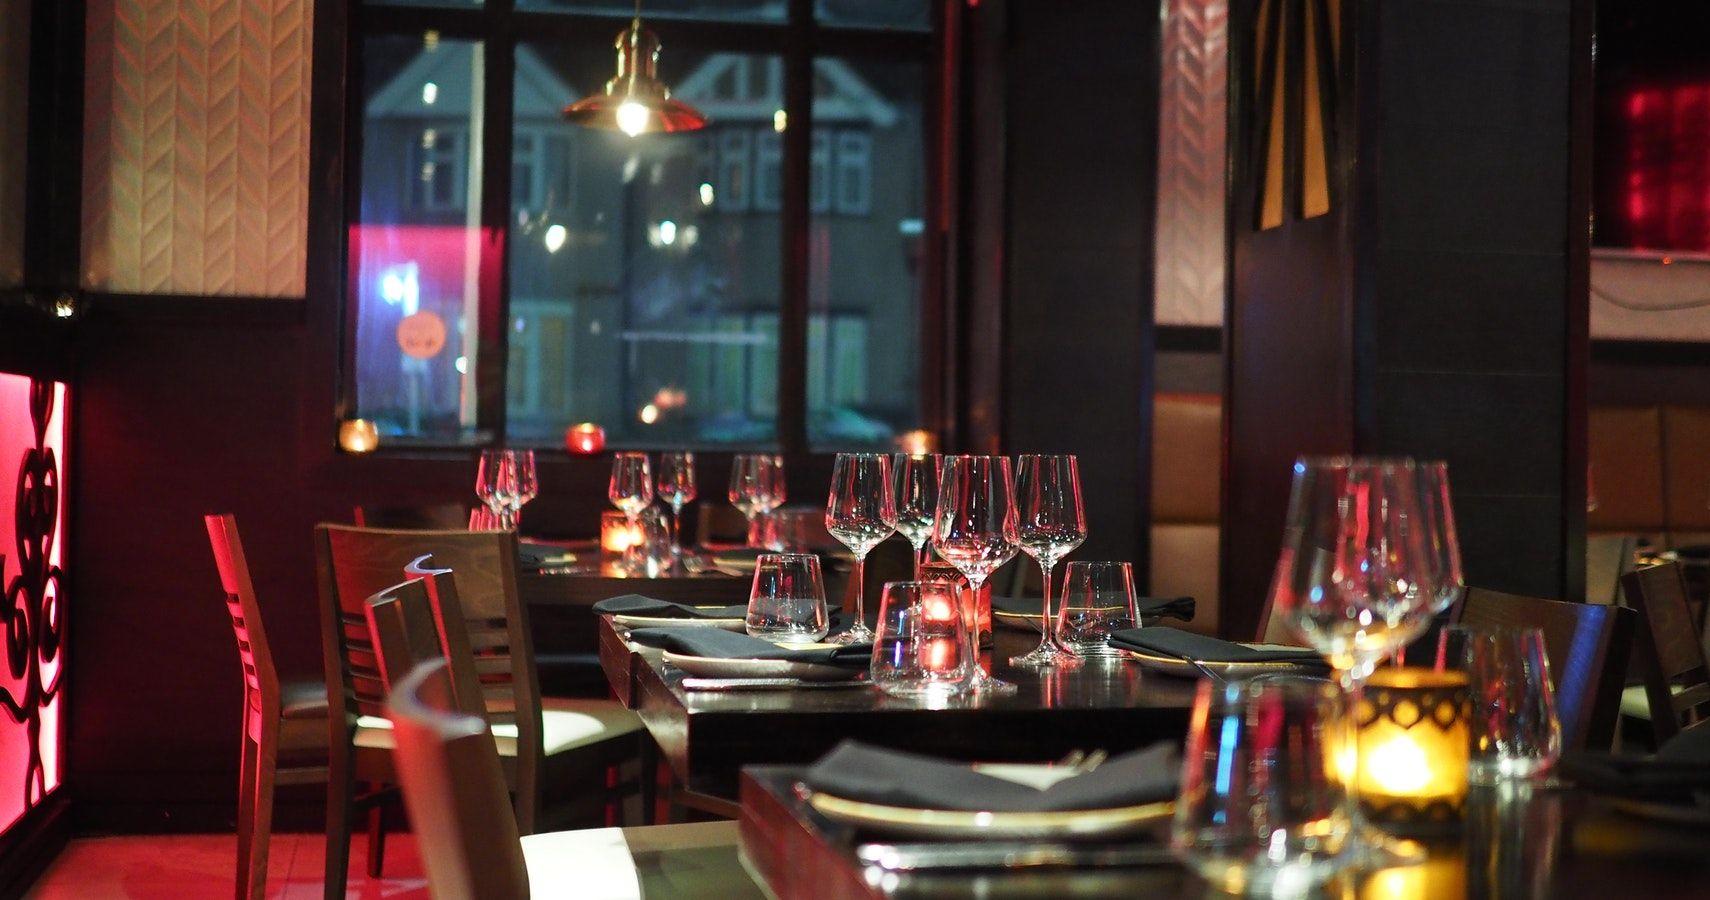 Star-Studded Dinners: 10 Most Popular Restaurants For Celebrity-Spotting In LA,